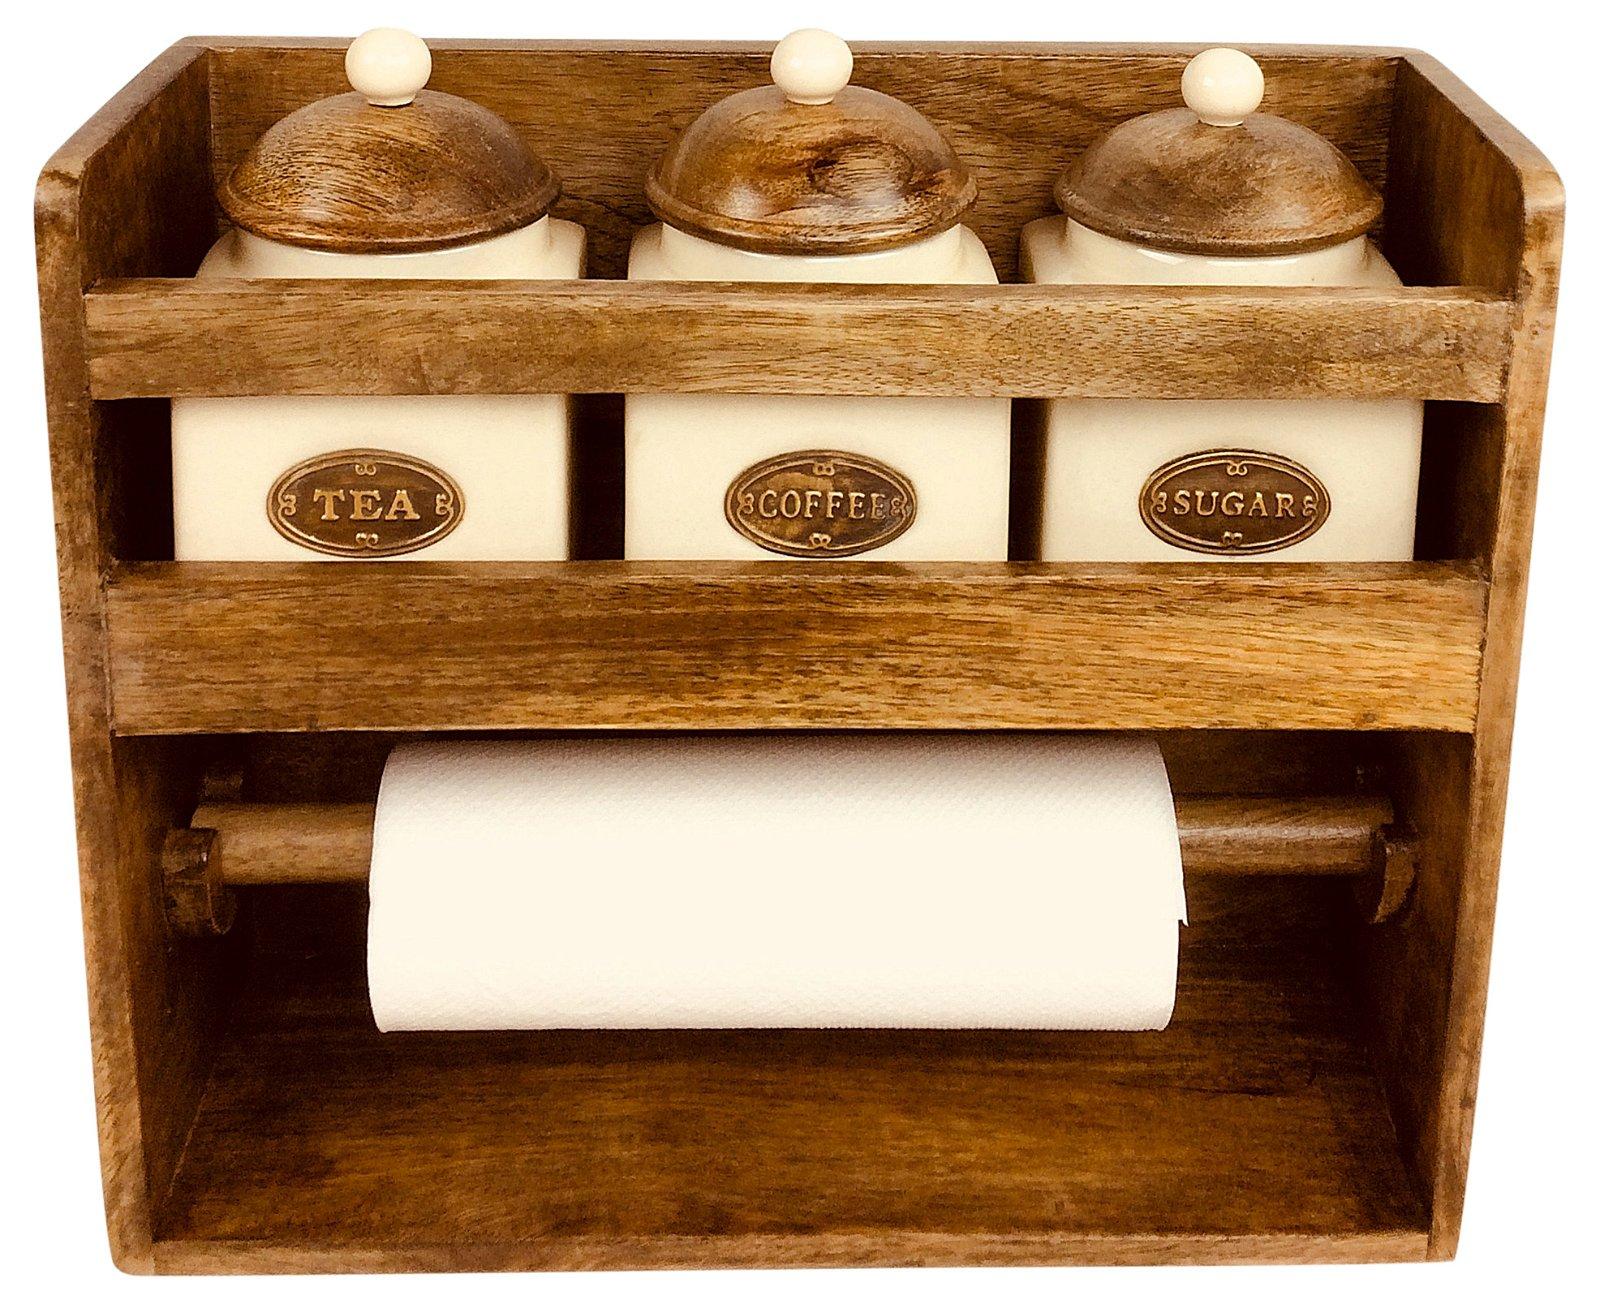 Kitchen Roll Holder With 3 Jars